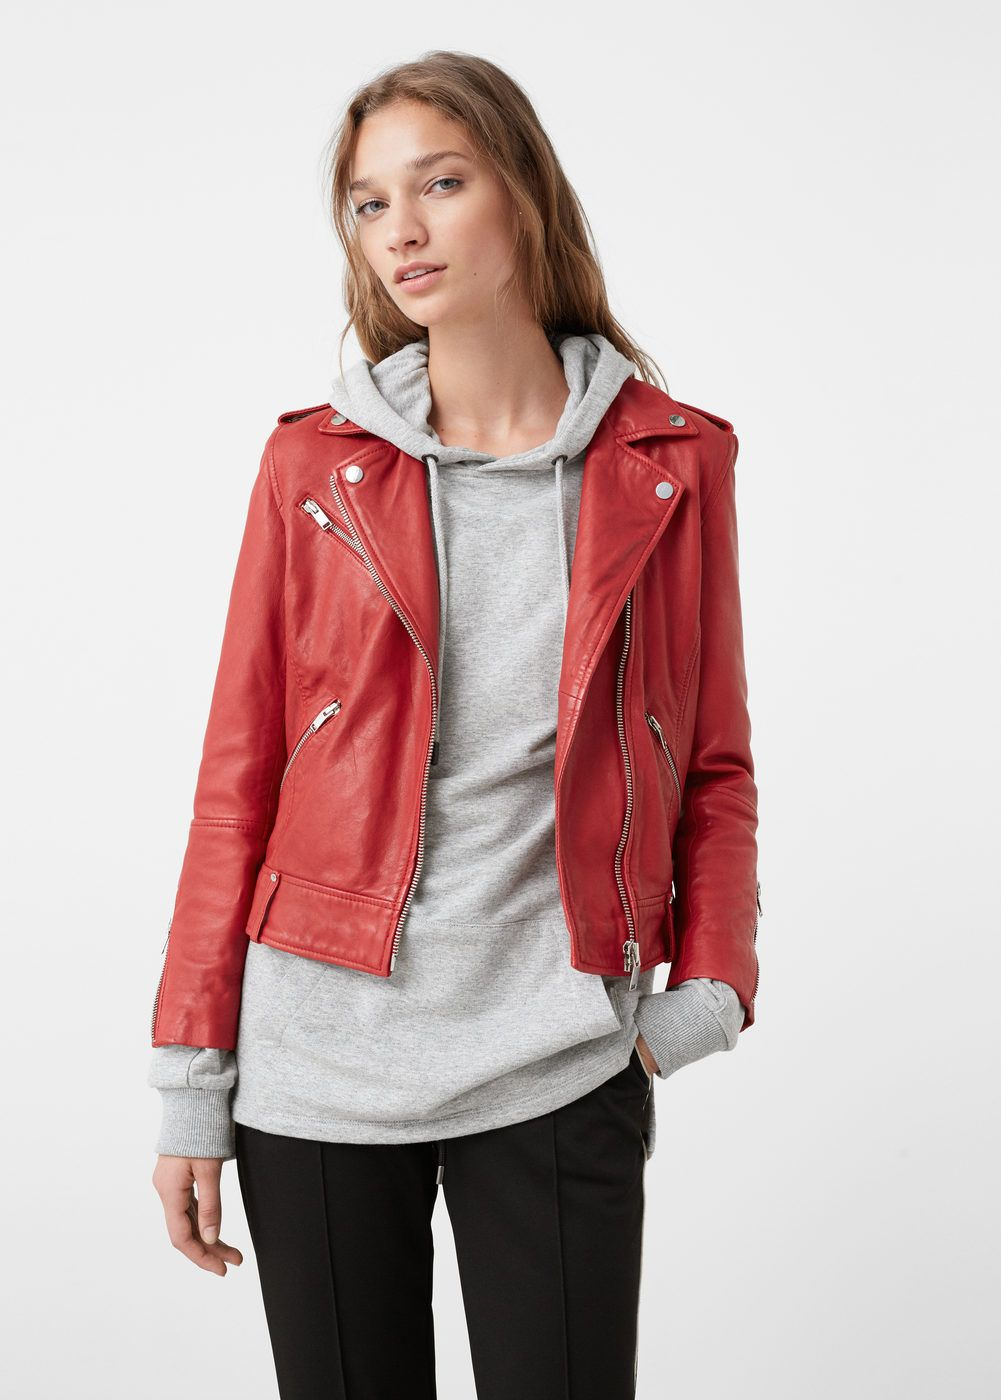 Leather biker jacket Jackets for women, Leather jacket